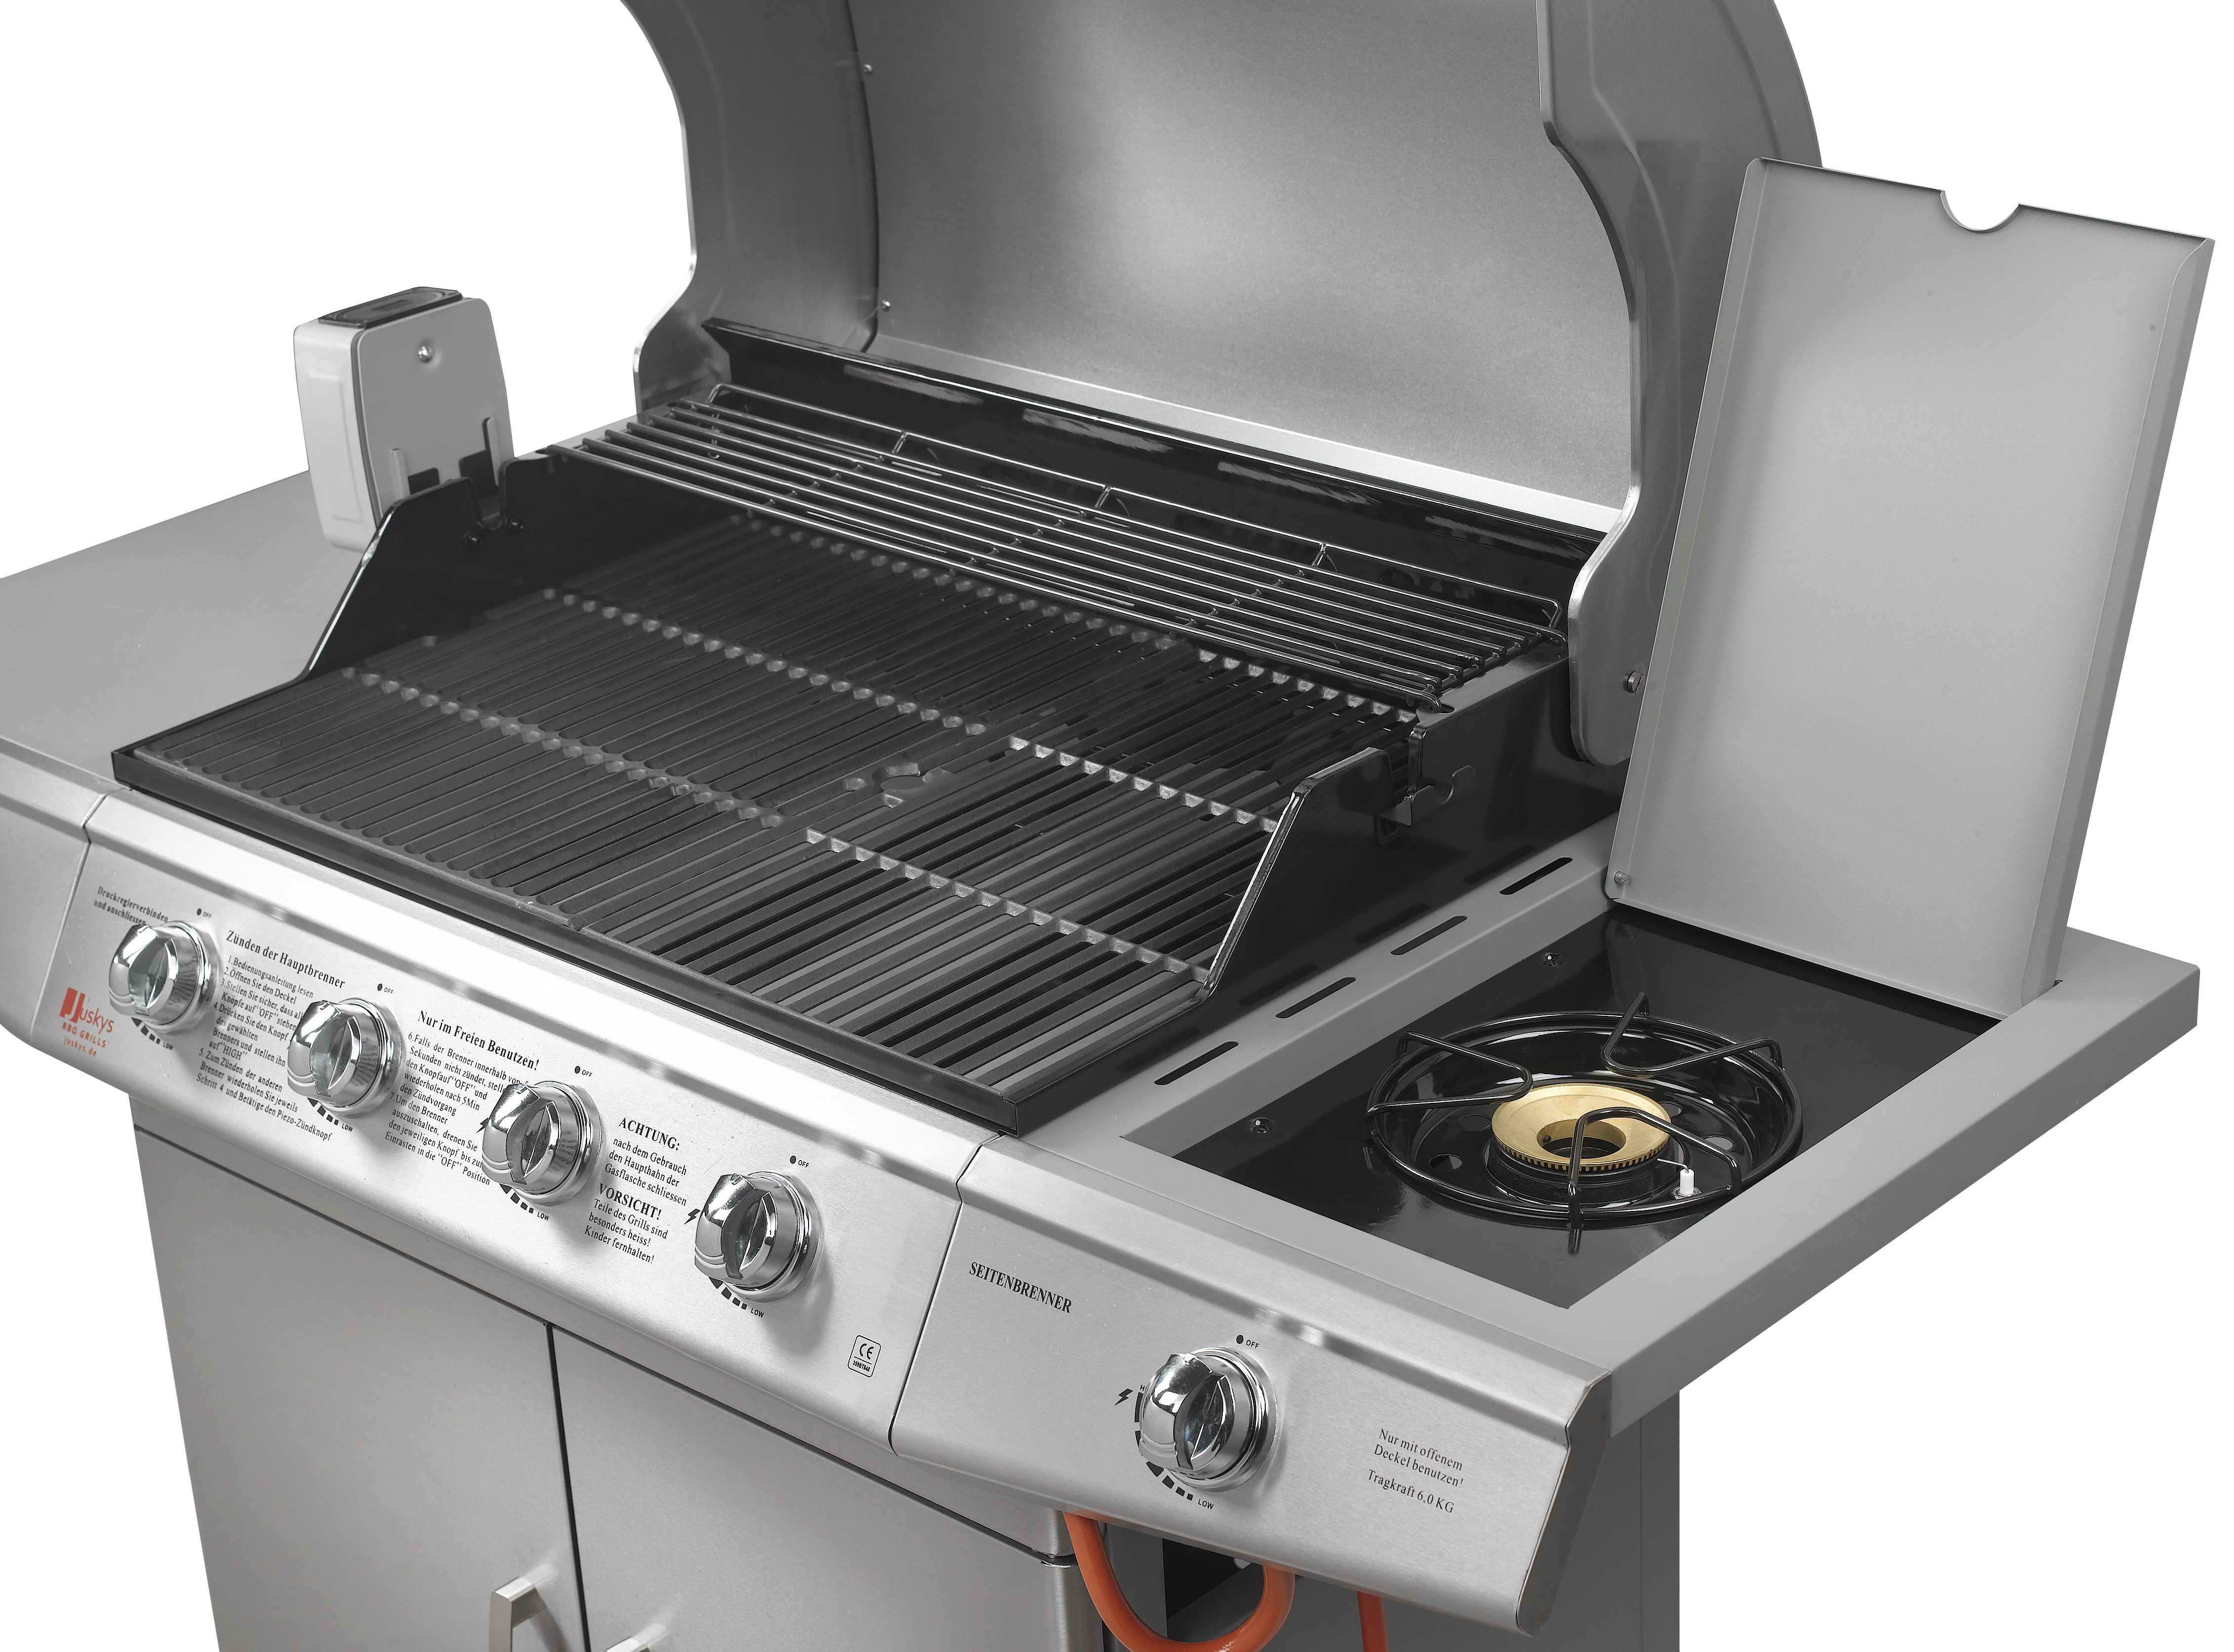 bbq gasgrill edelstahl gas grill grillwagen barbecue ebay. Black Bedroom Furniture Sets. Home Design Ideas